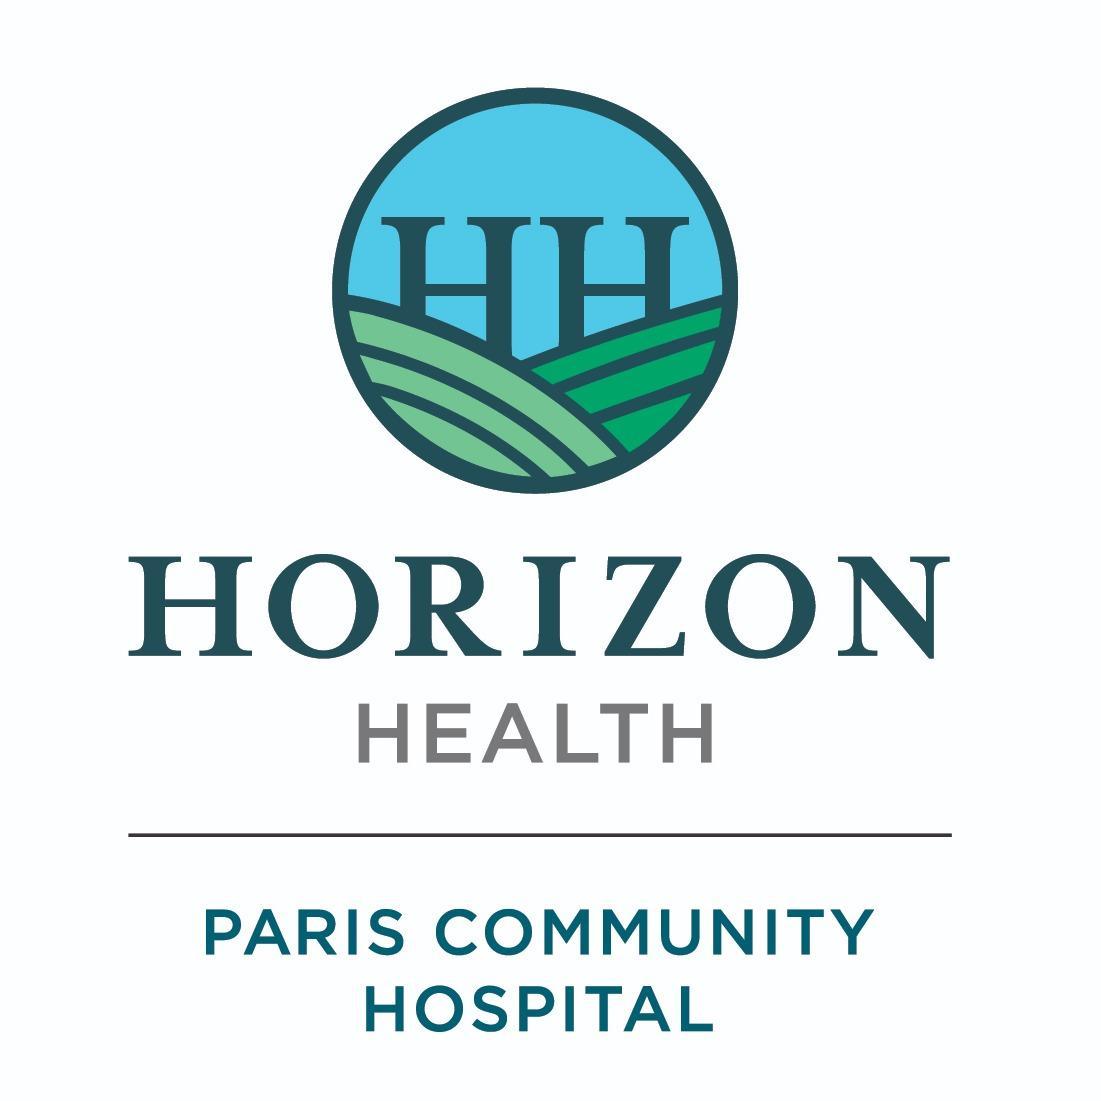 Paris Community Hospital image 8